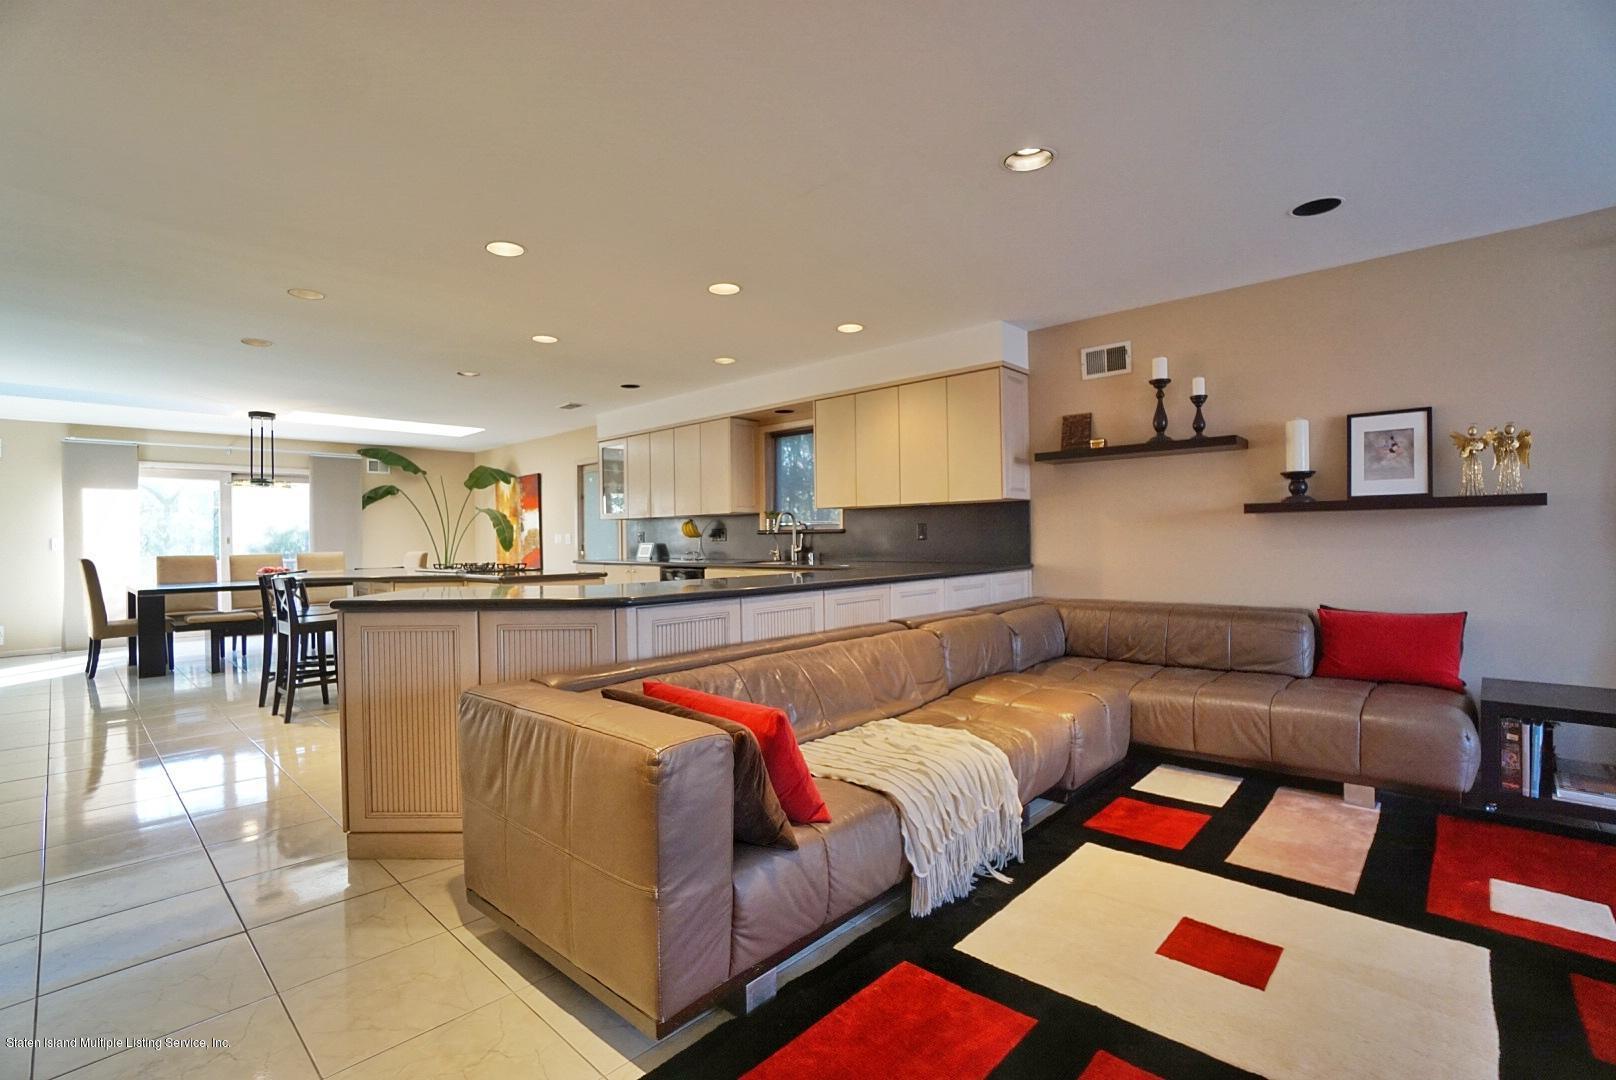 Single Family - Detached 183 Kensington Avenue  Staten Island, NY 10305, MLS-1127107-17